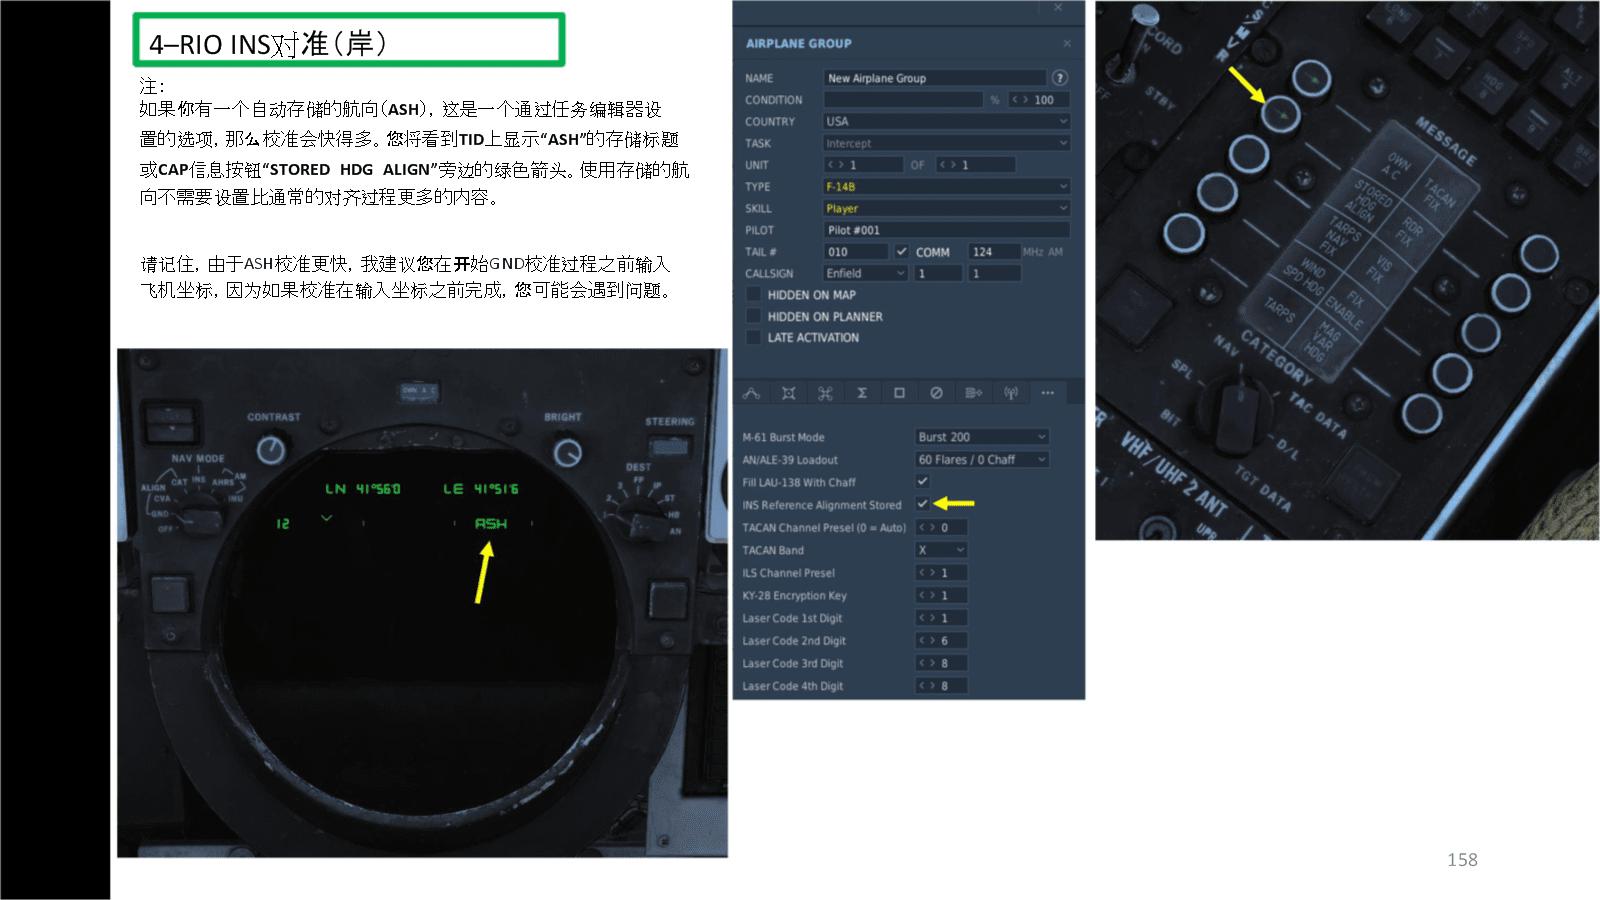 B Tomcat雄猫战斗机 中文指南 4.5RIO INS对准(航母).docx